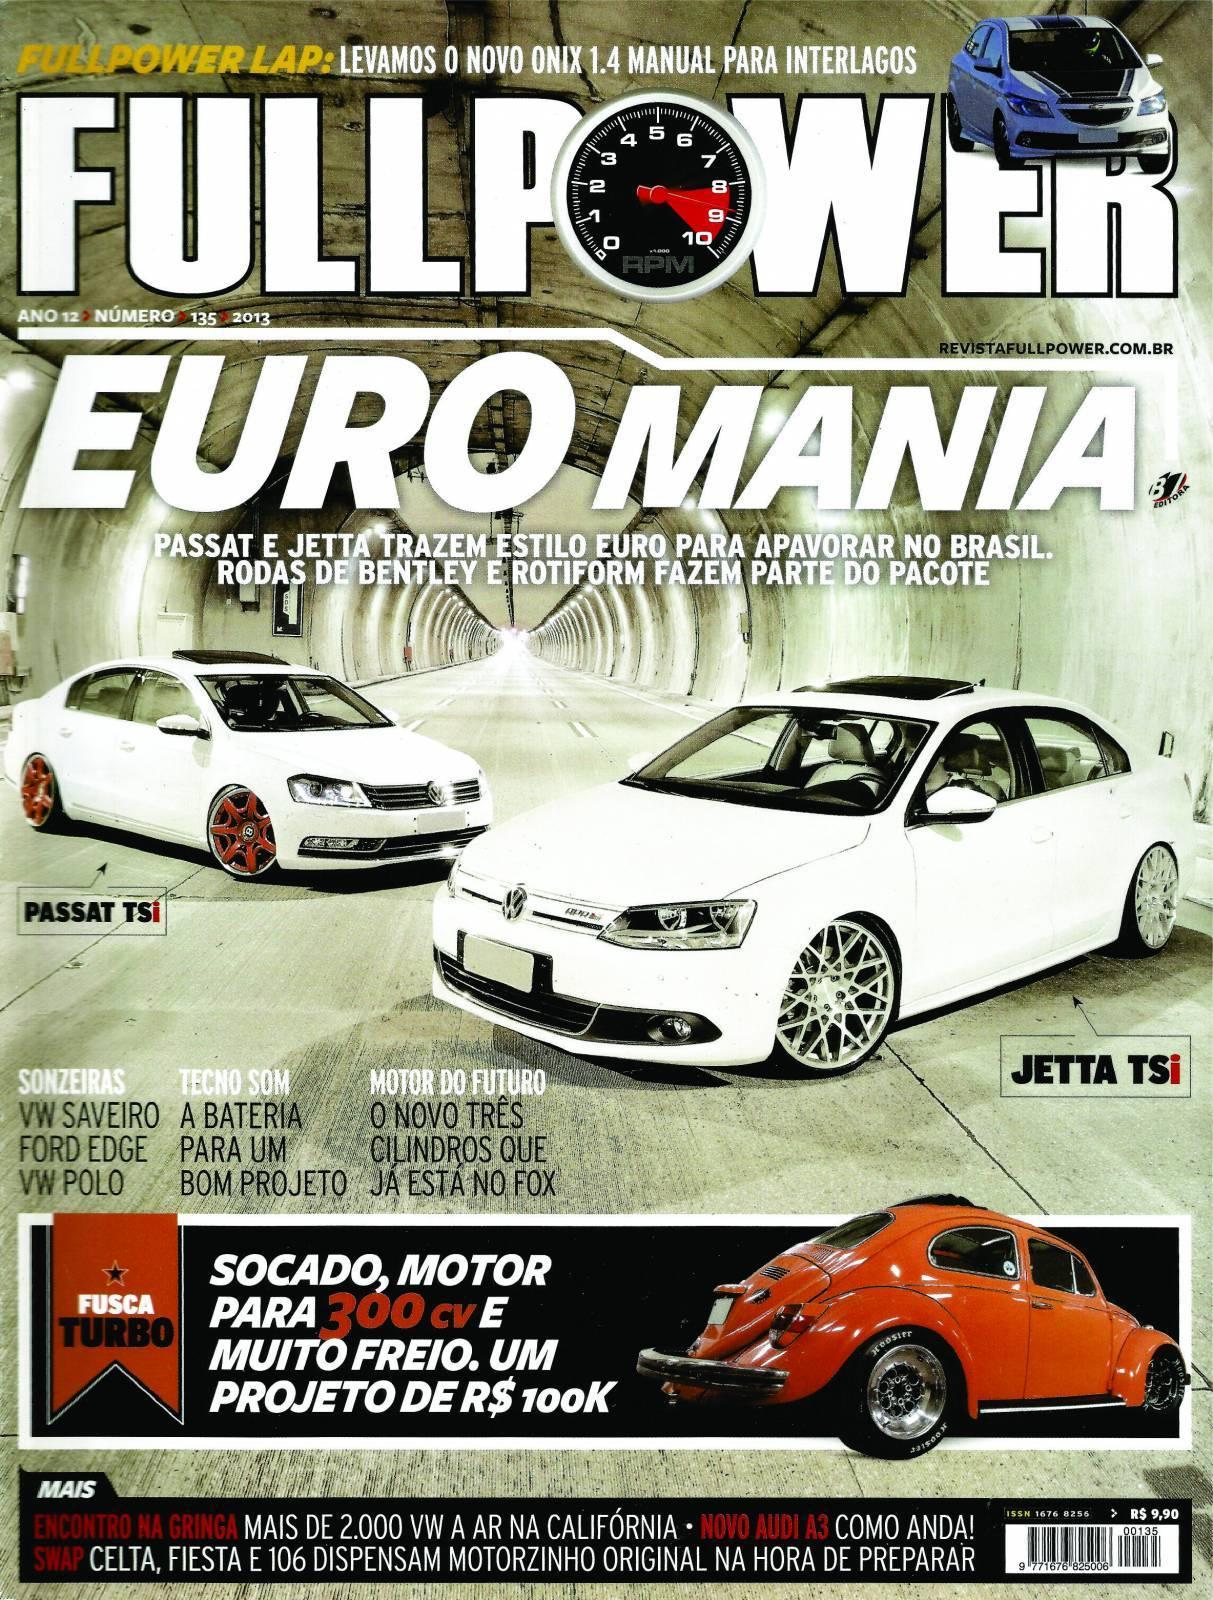 REVISTA FULLPOWER No. 135 ANO 2013 - Loja FullPower